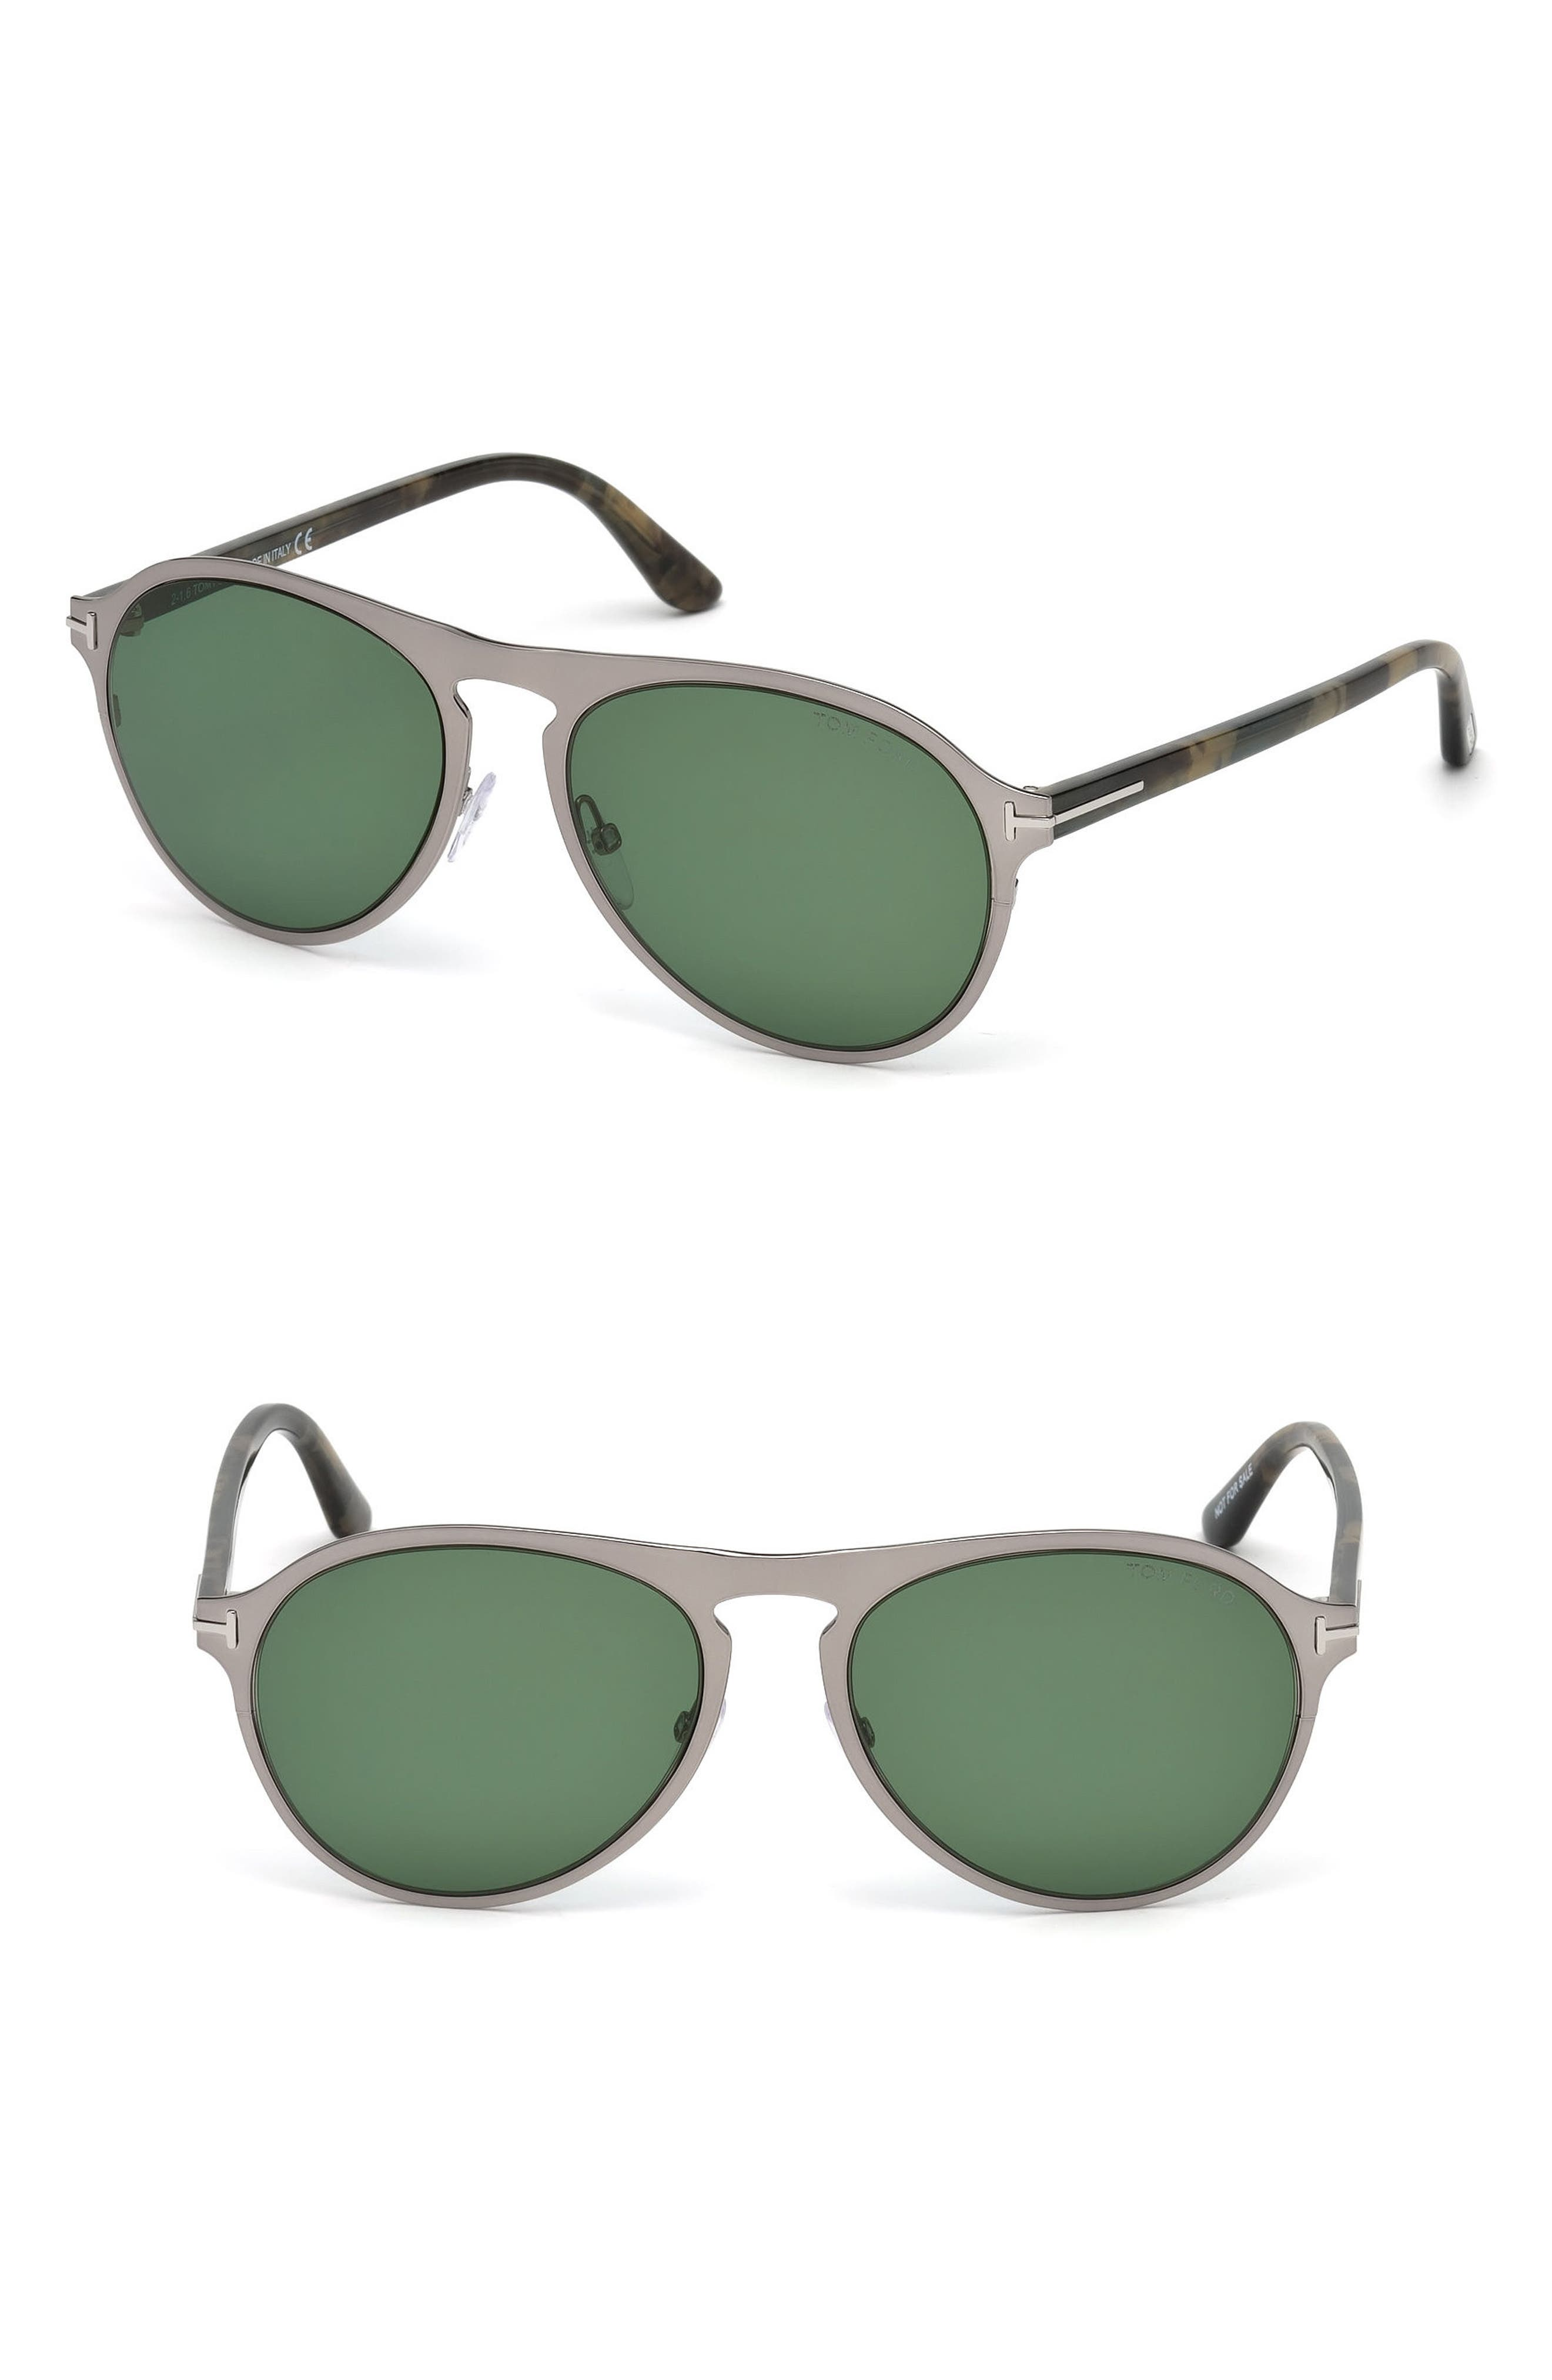 Main Image - Tom Ford Bradburry 56mm Sunglasses